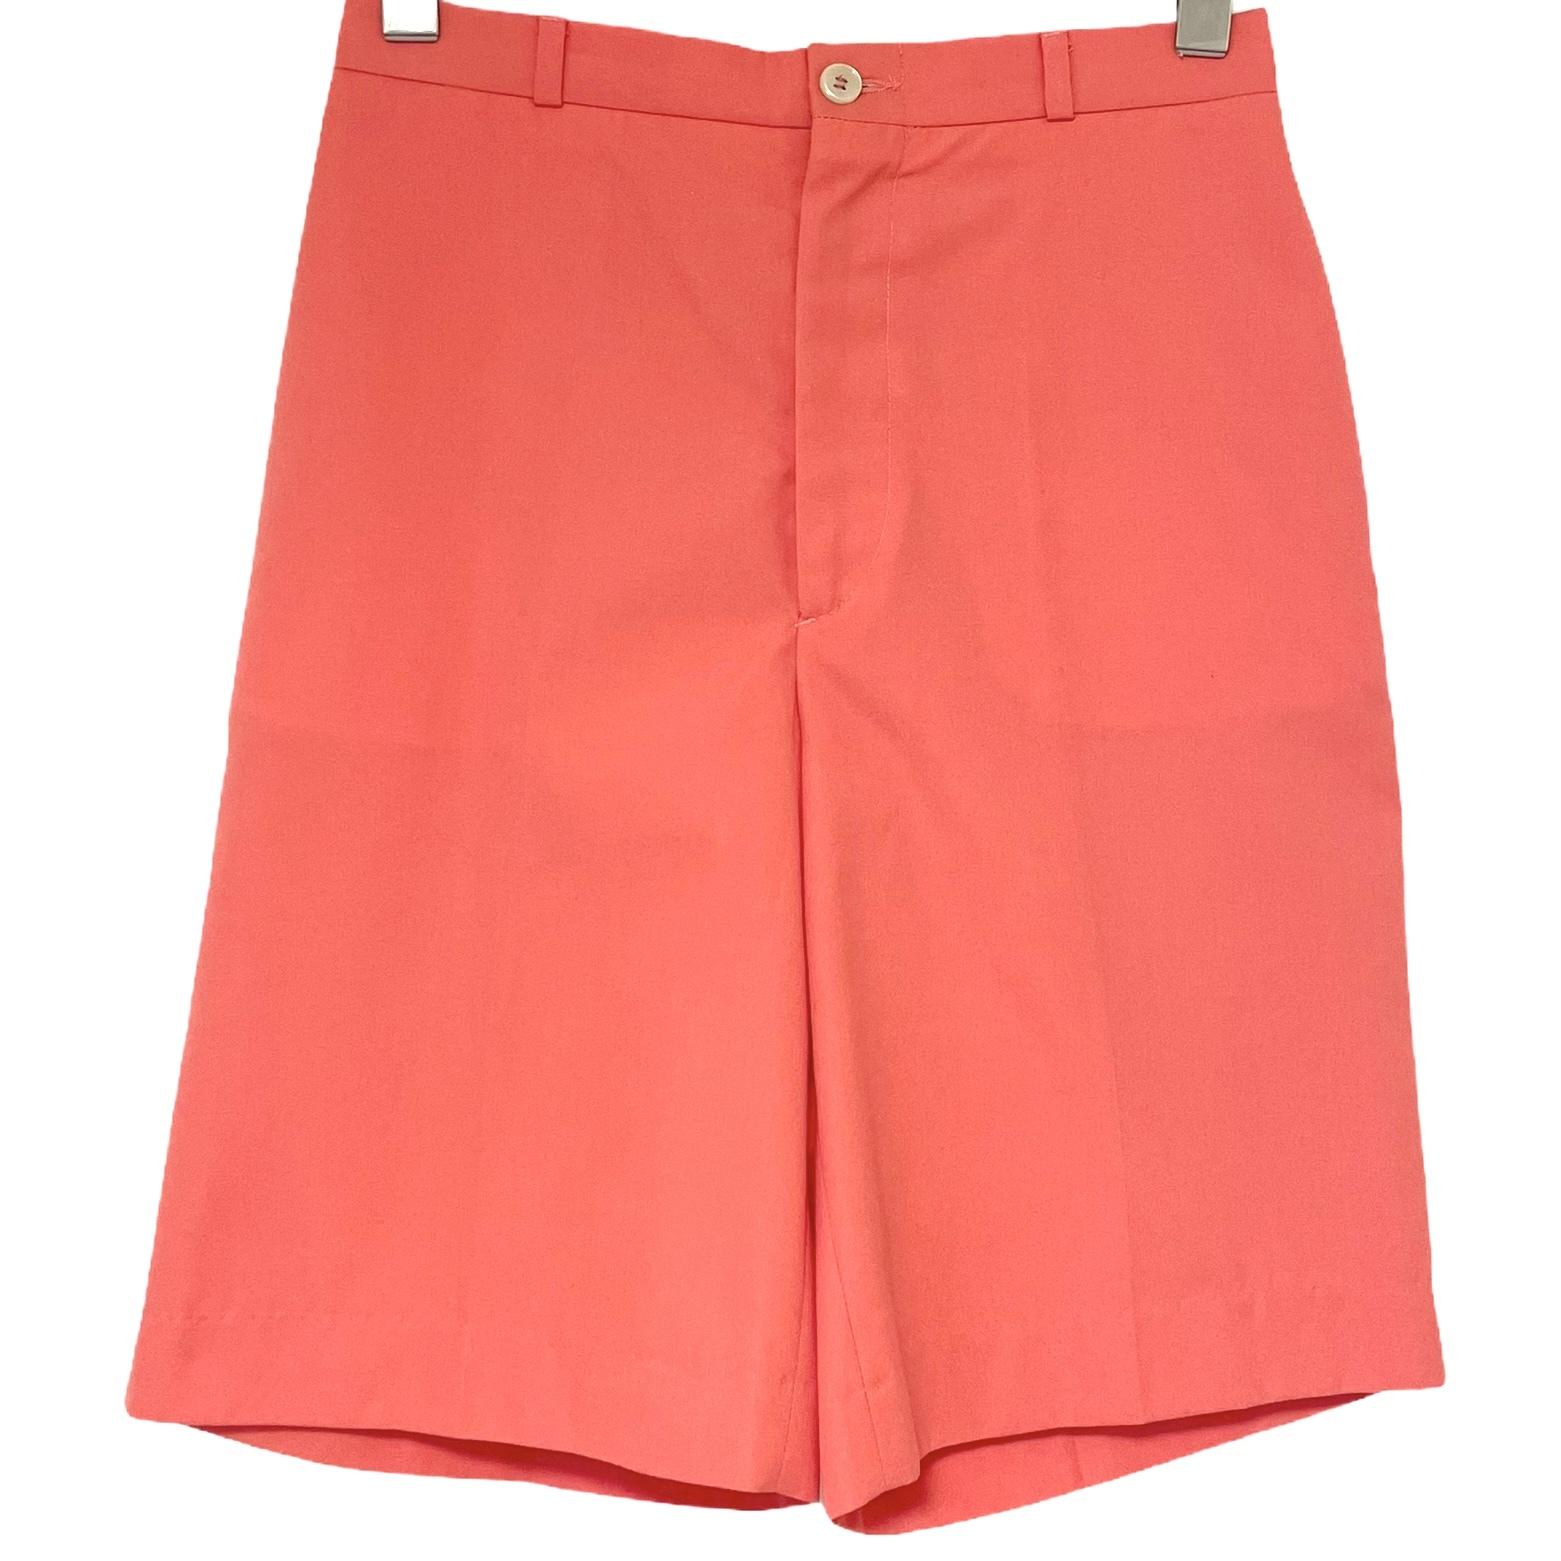 LADY THOMSON Pink Half Chino Pants